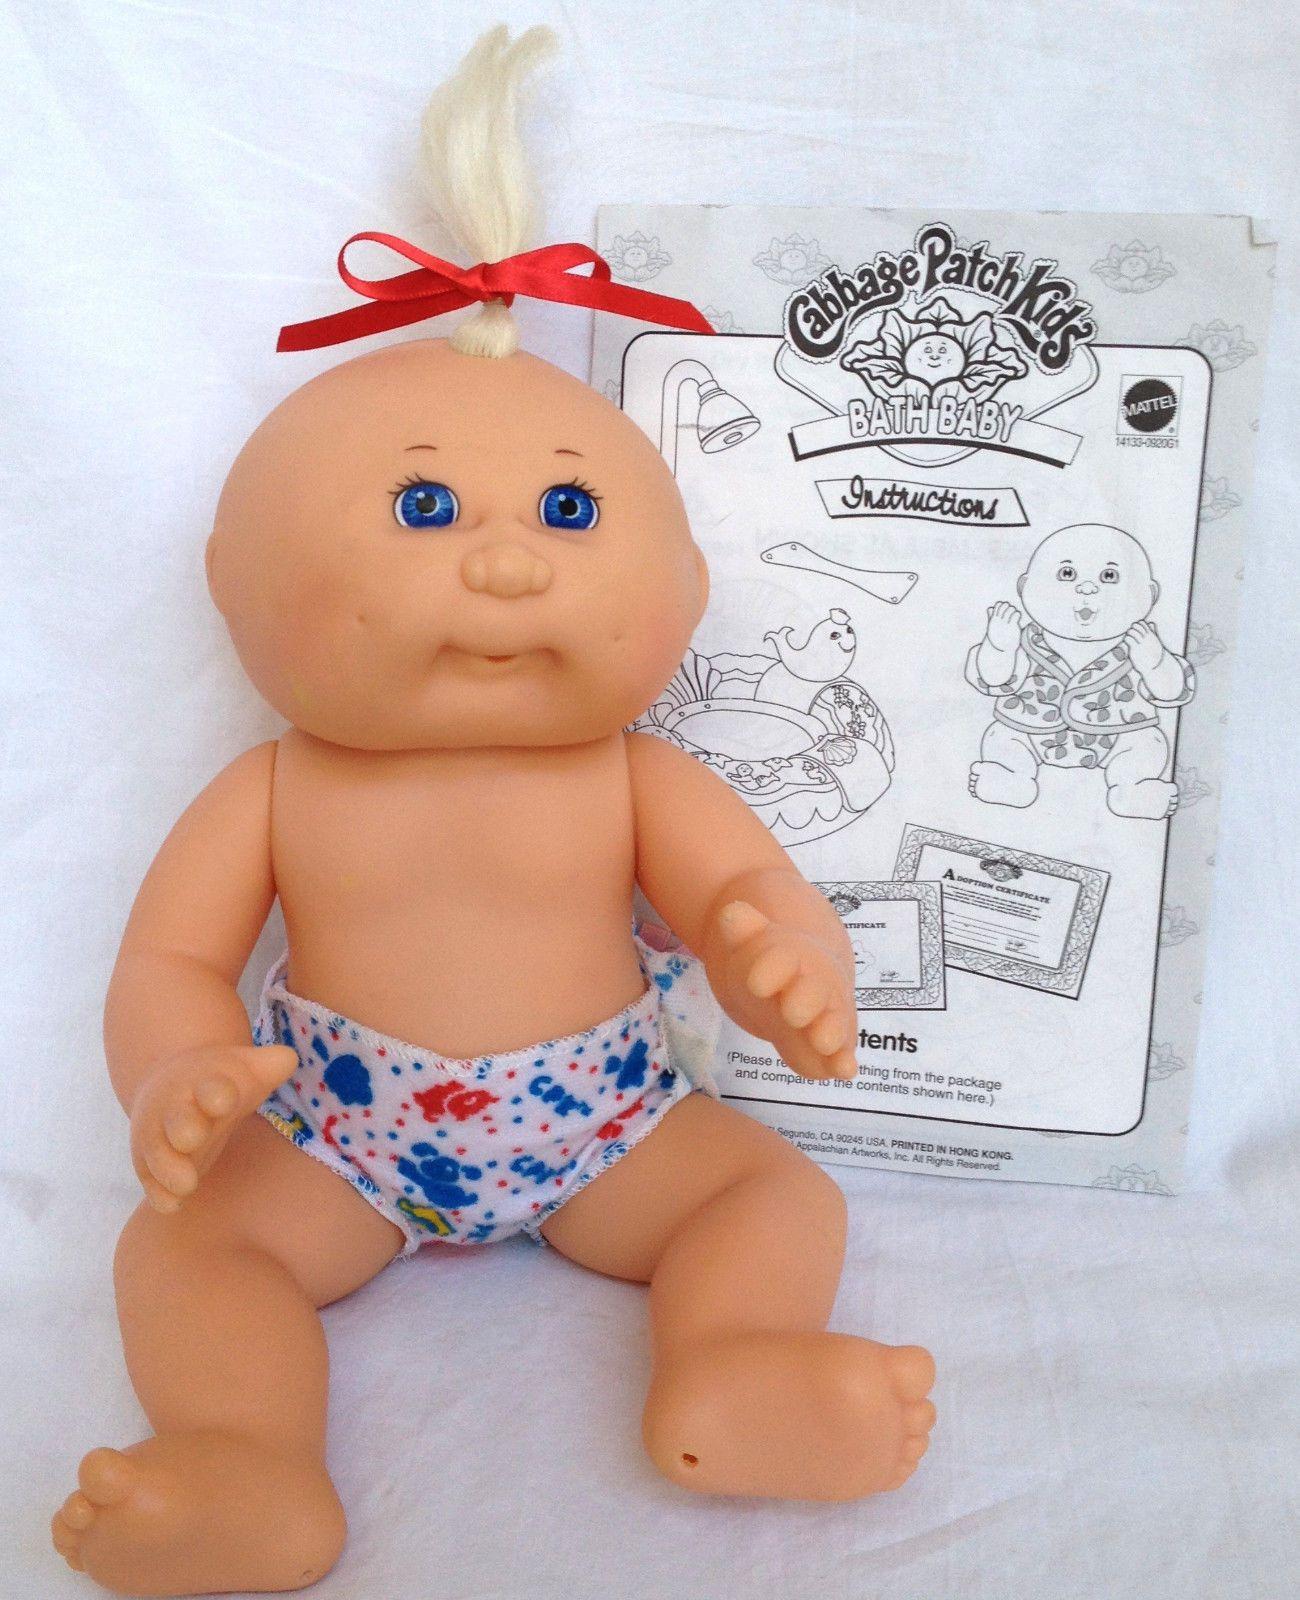 Mattel First Edition 1995 Cabbage Patch Kids 11 Bath Baby Instructions Ebay Cabbage Patch Kids Baby Bath Cabbage Patch